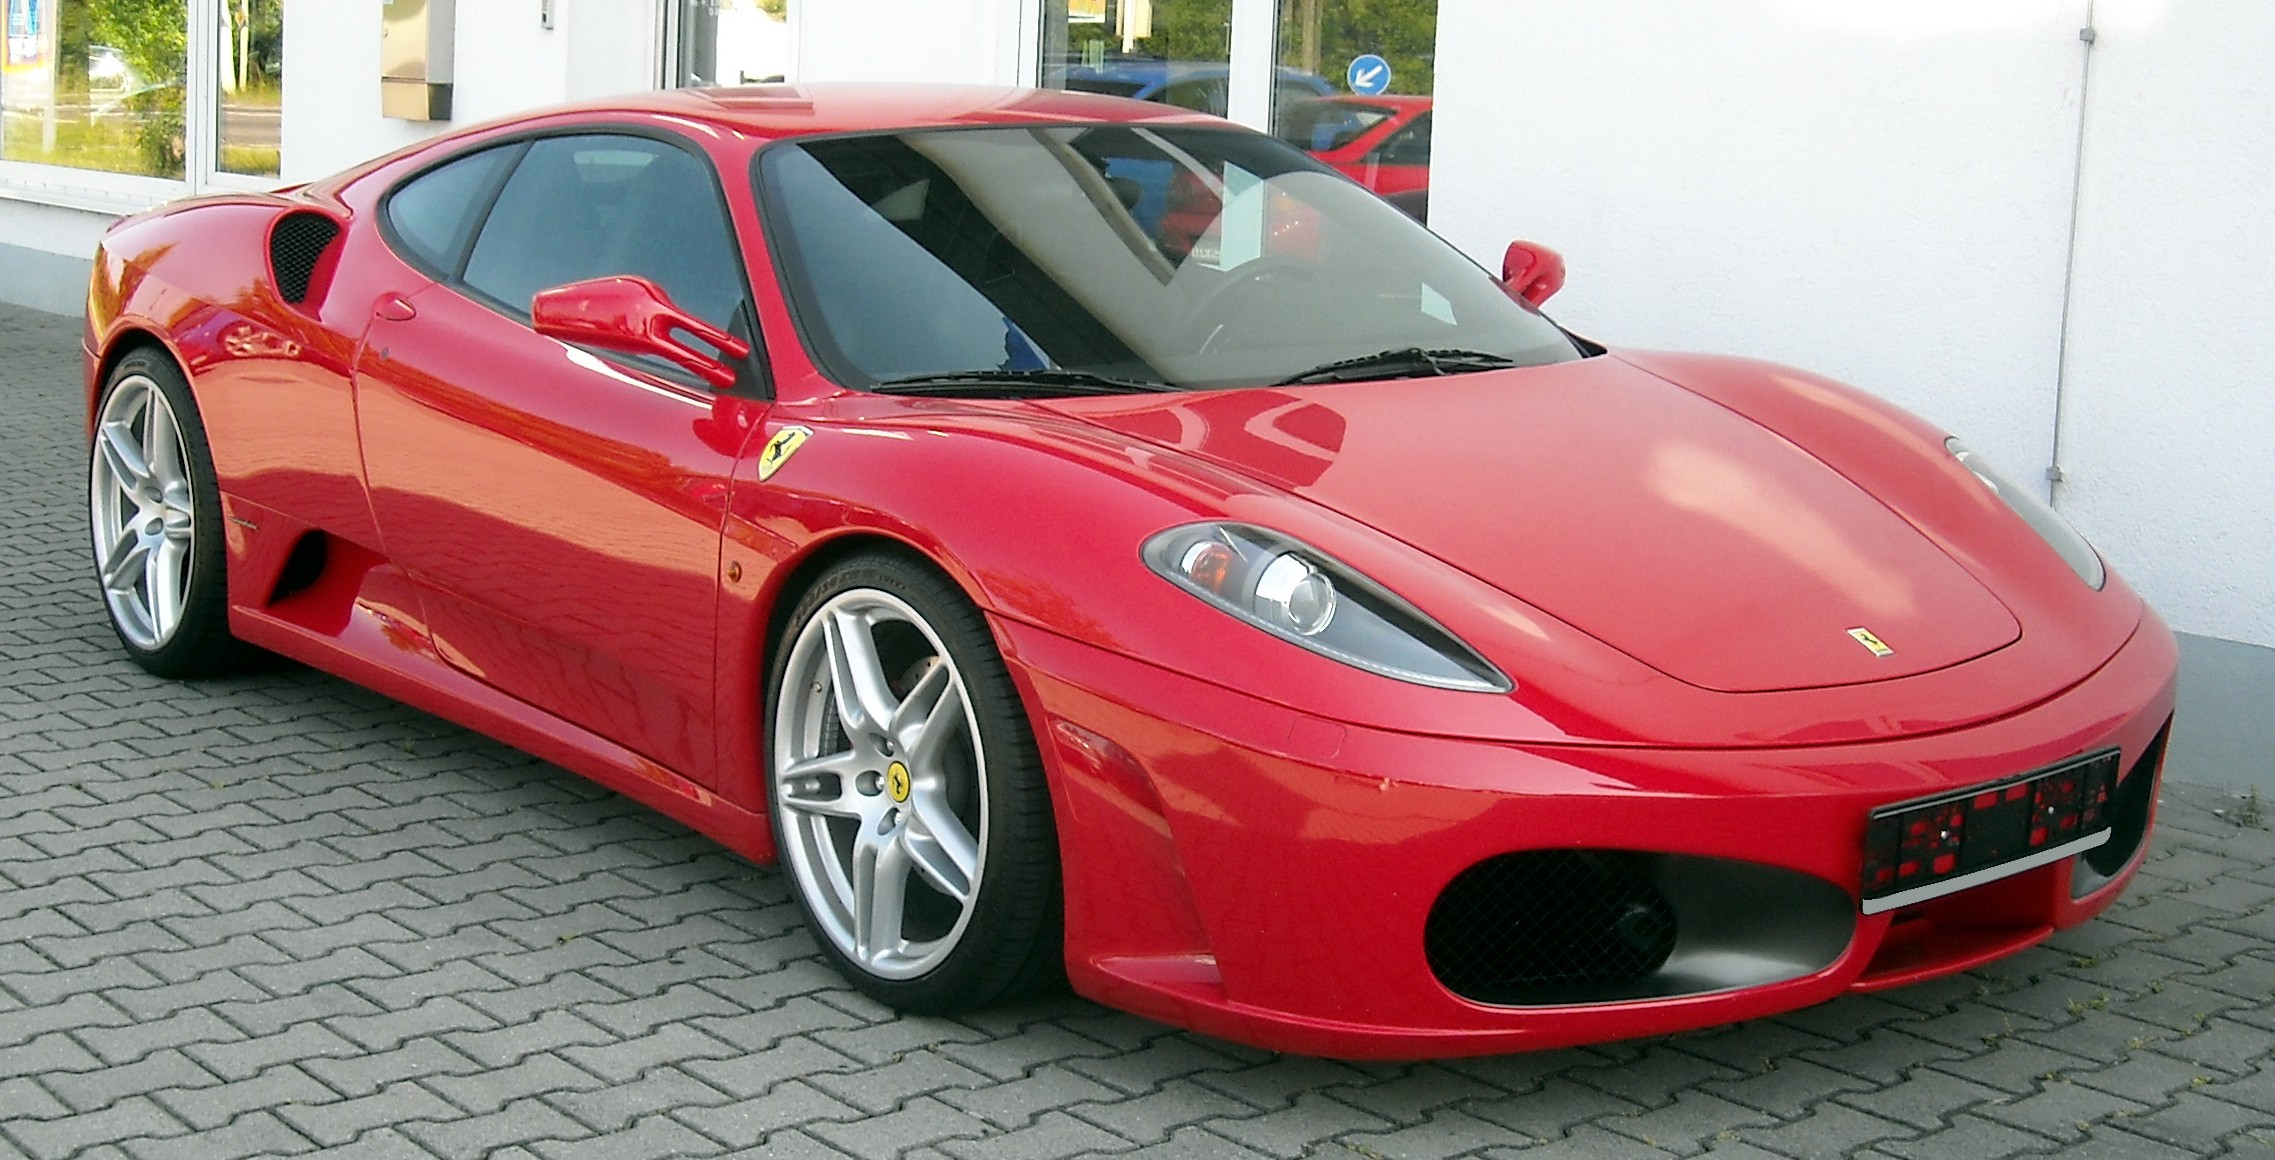 Ferrari_F430_front_20080605